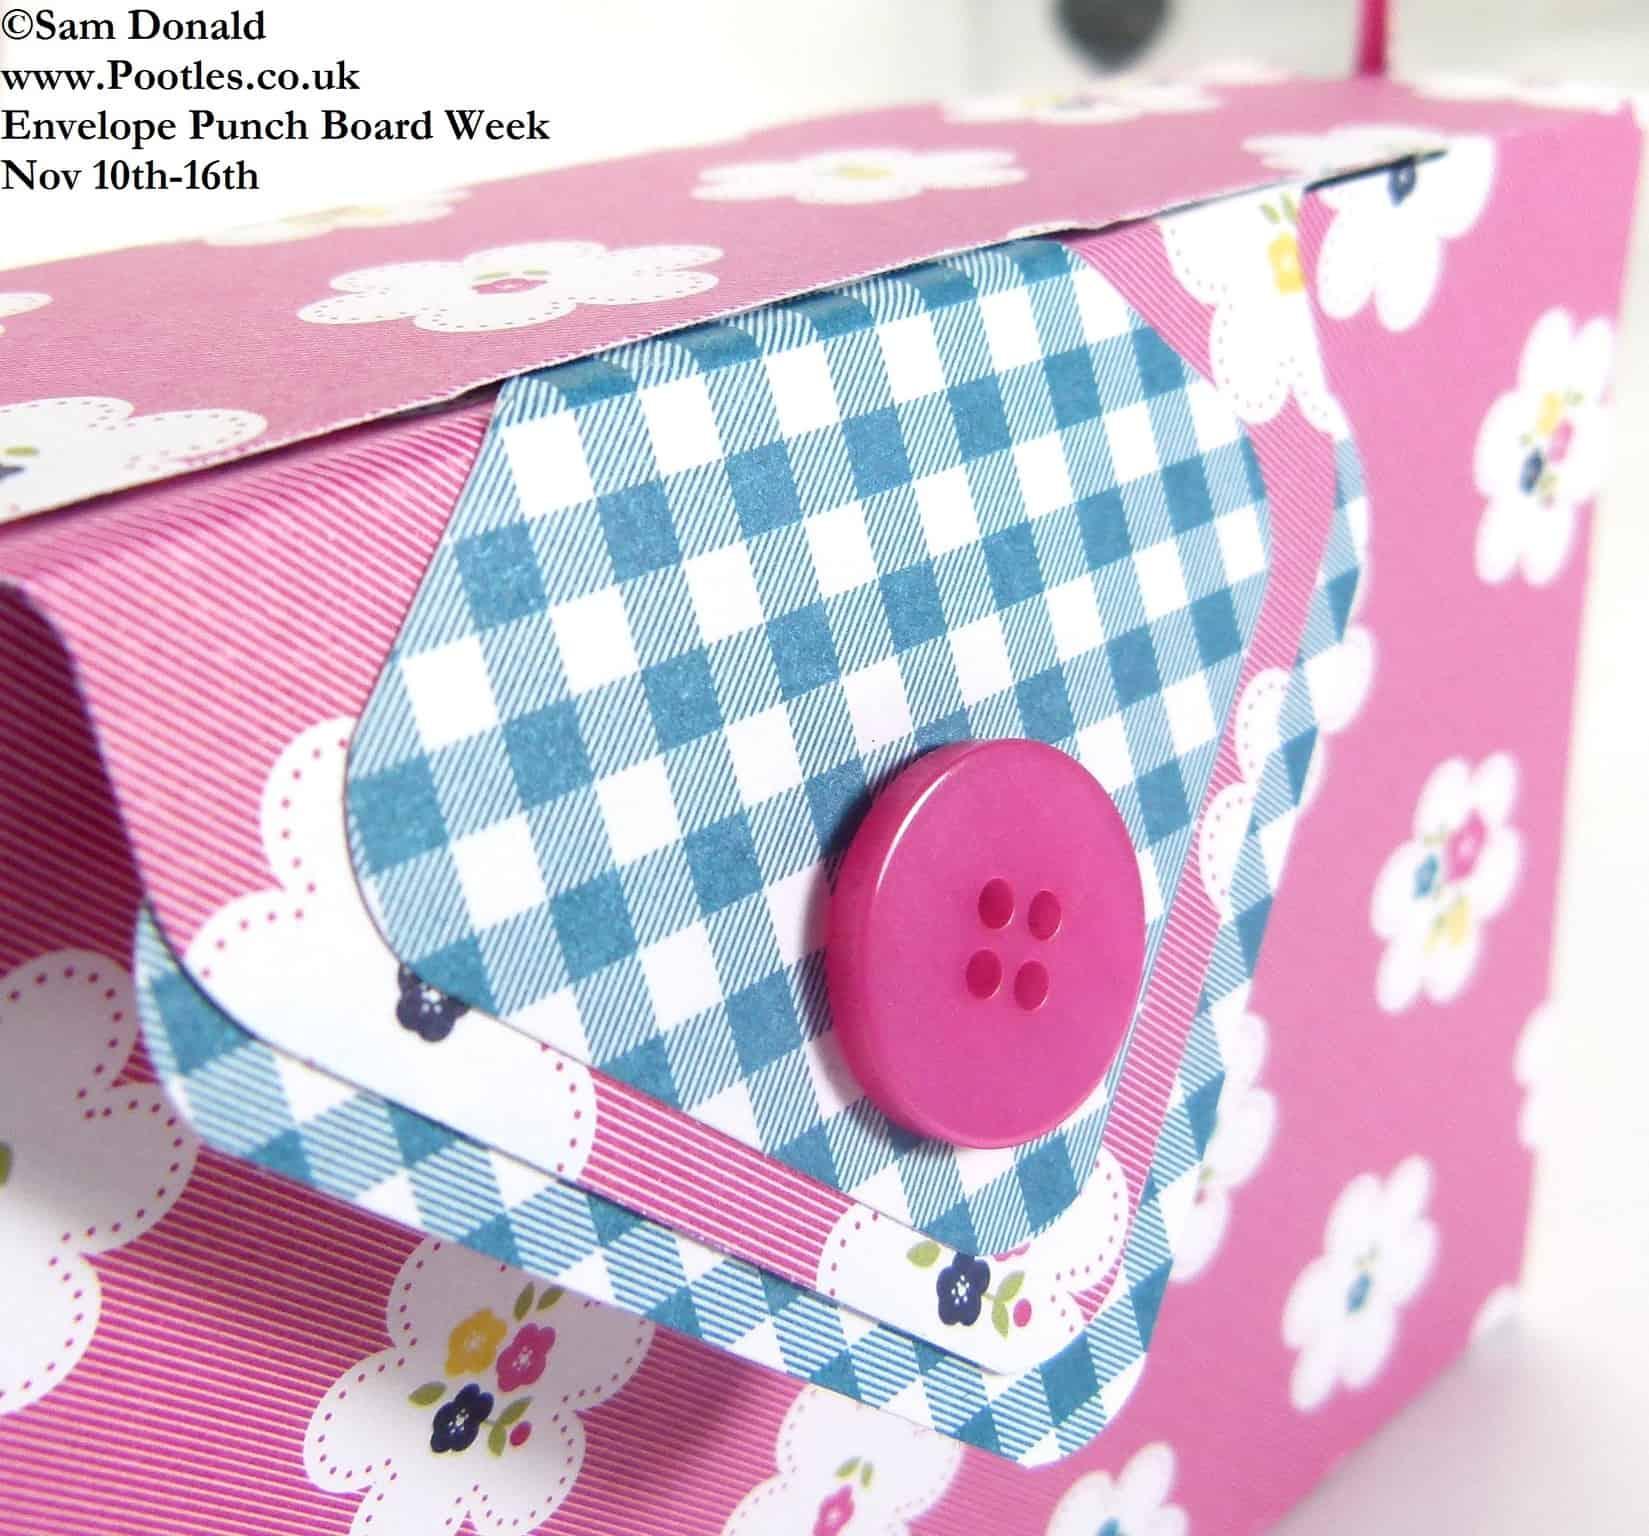 Envelope Punch Board Week – The Clutch Bag